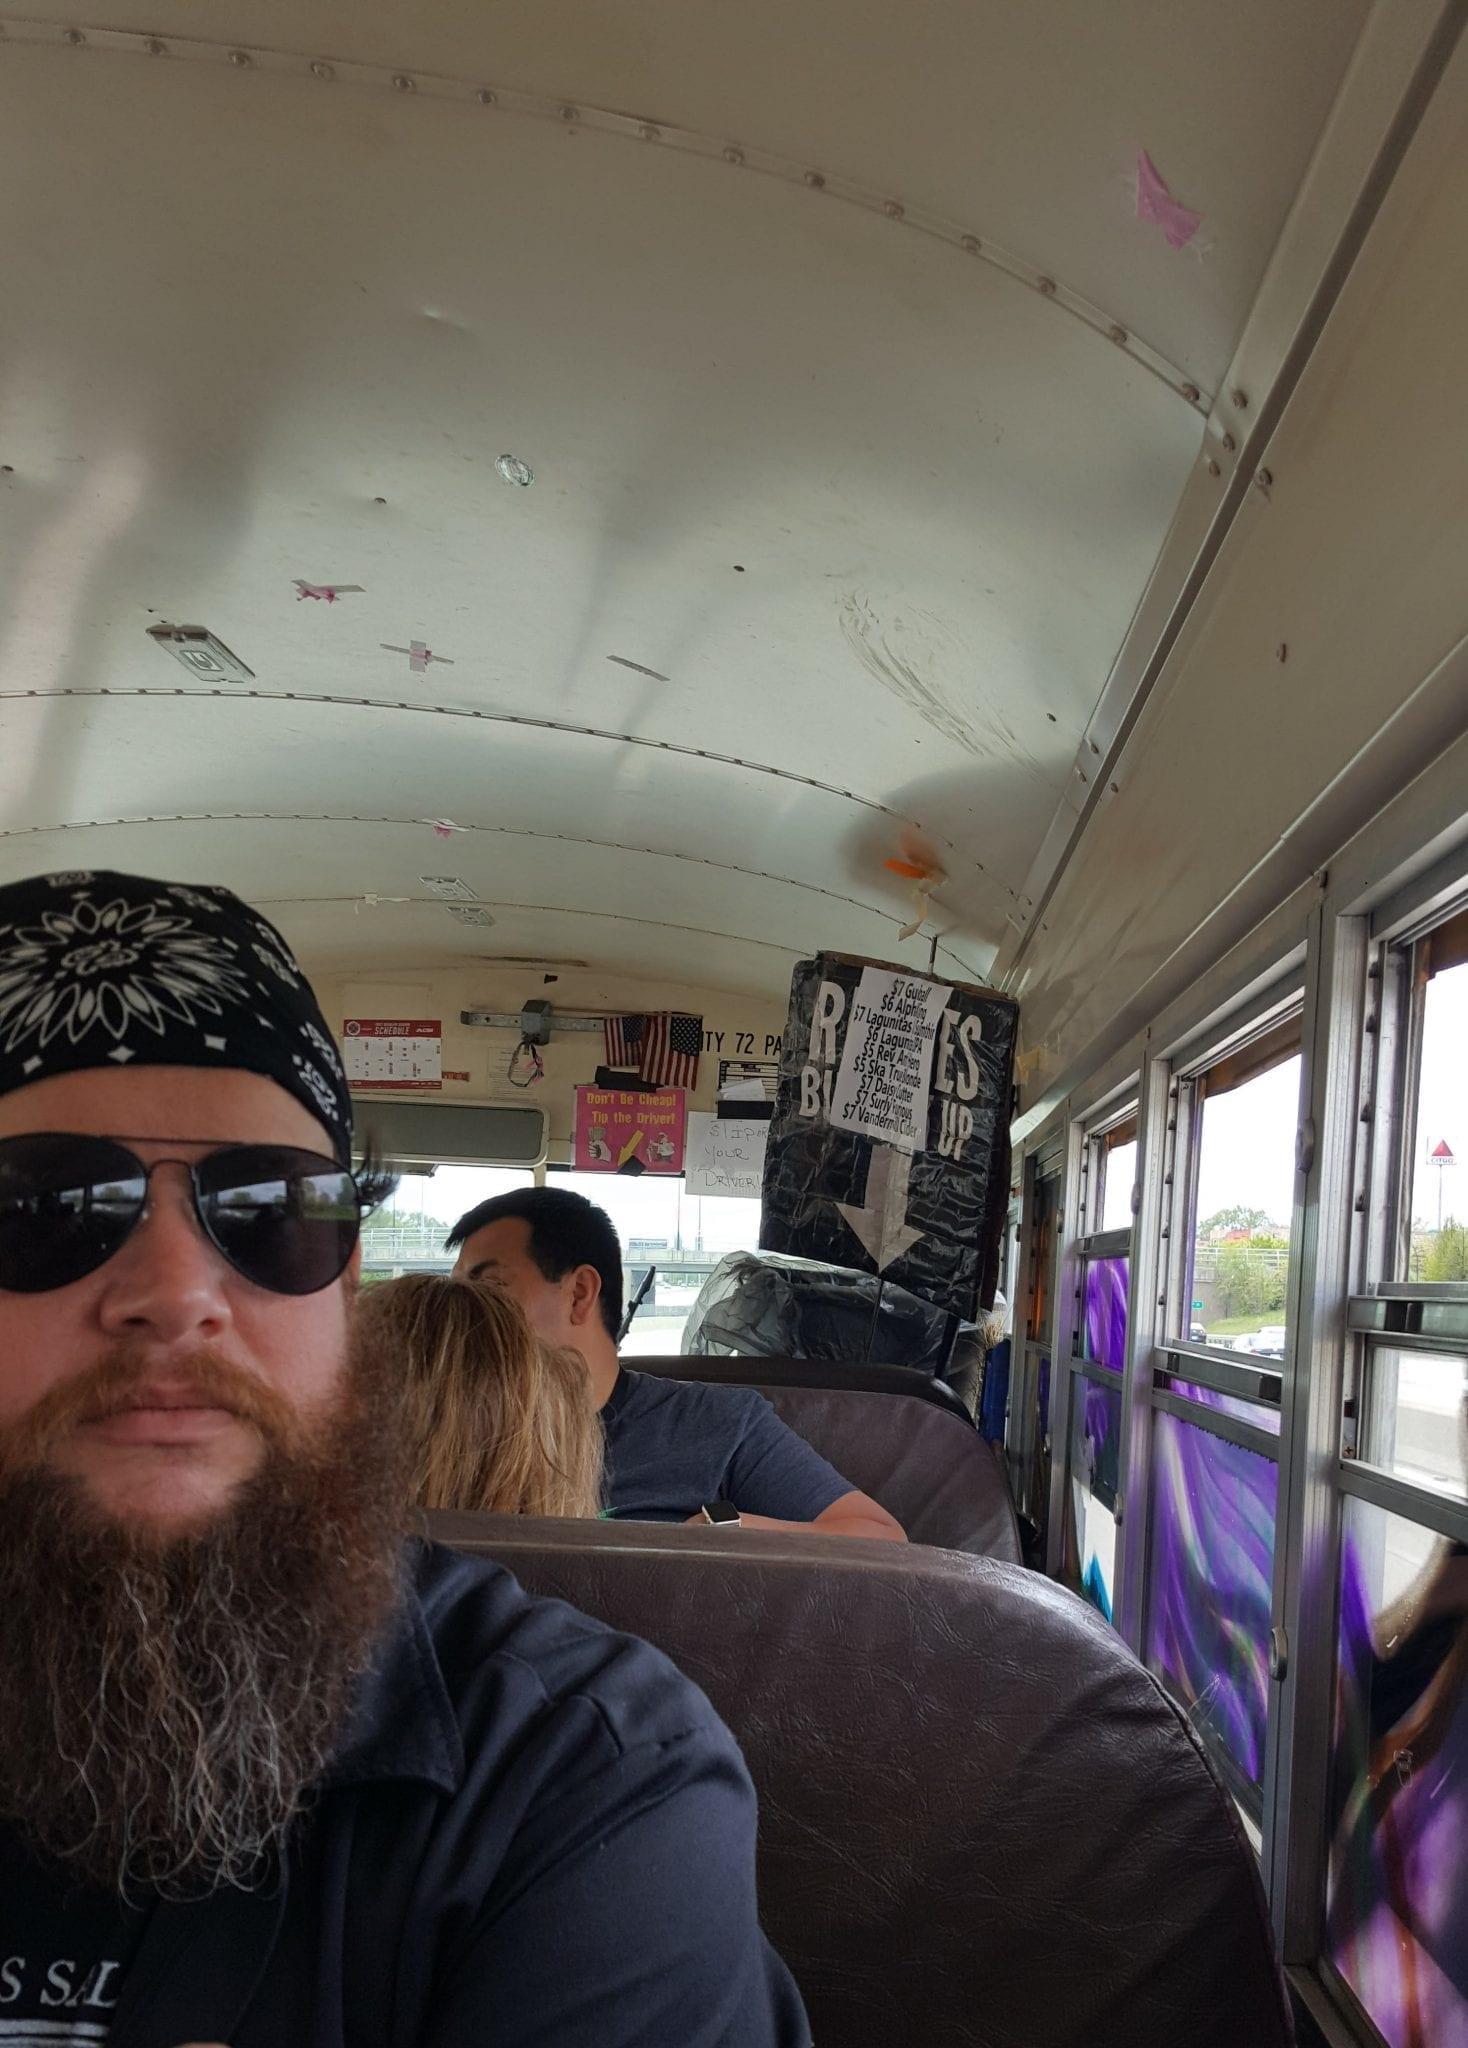 On the Reggies bus